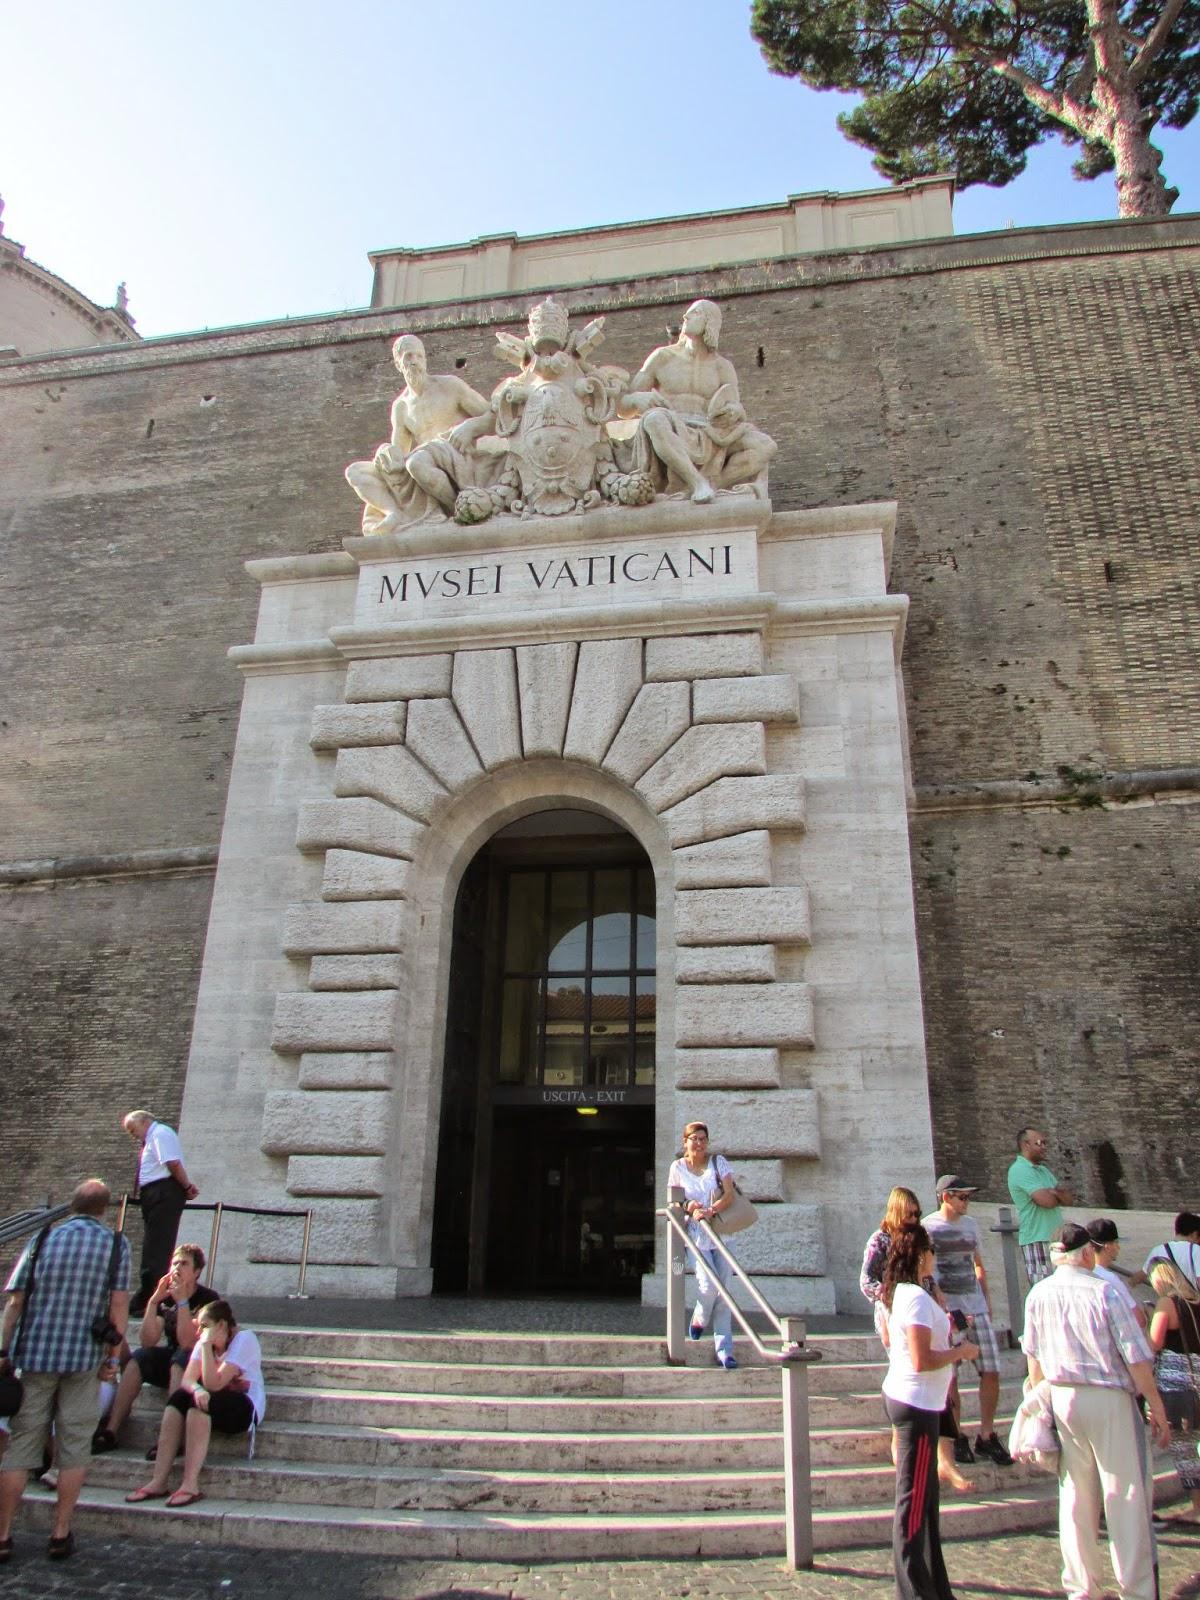 Itália, Roma, turismo, Europa, Italy, travel, trip, viagem, Italia, Vaticano